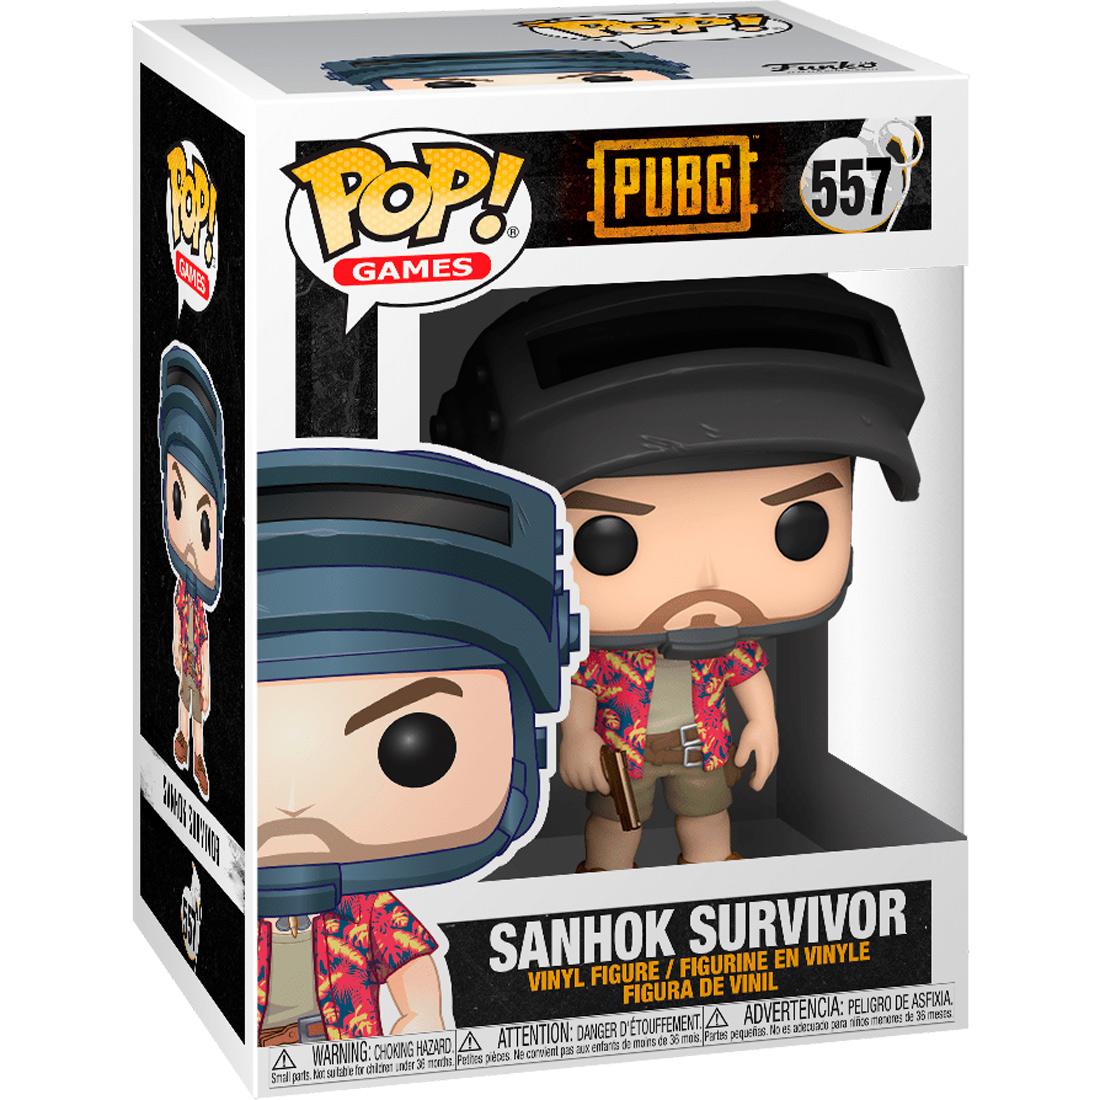 Funko Pop Games PUBG 557 Sanhok Survivor